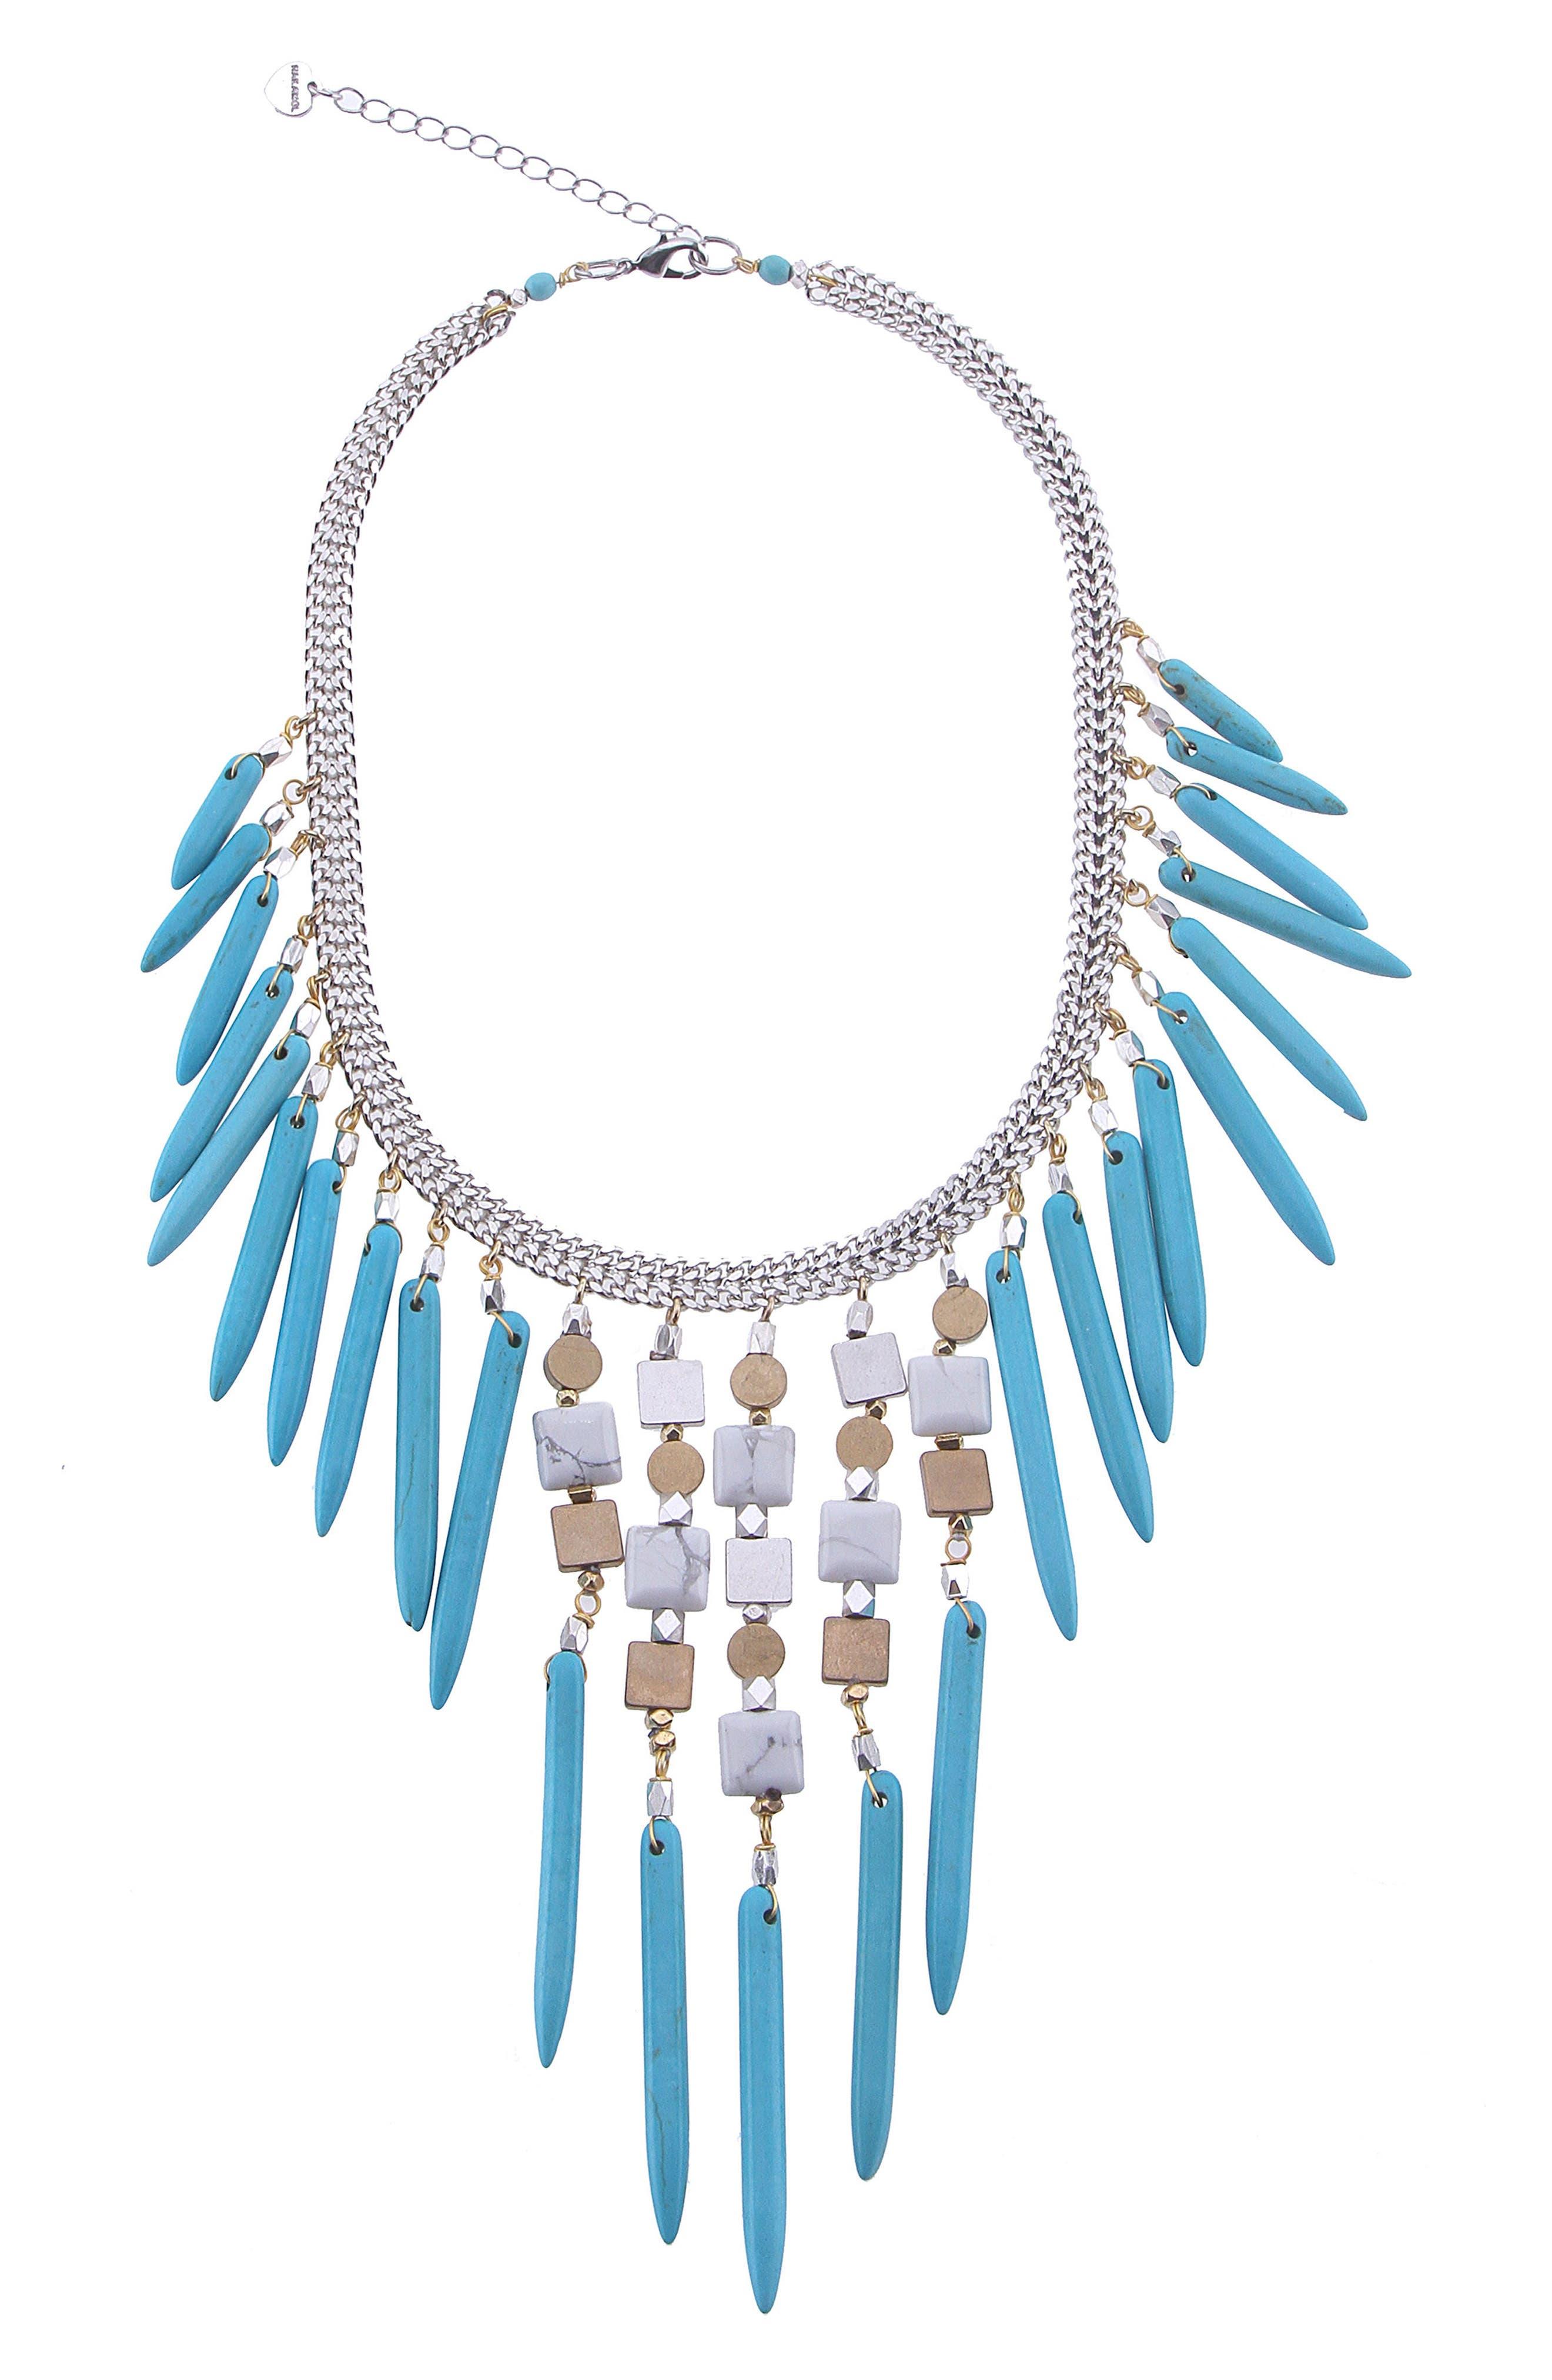 Fringe Magnesite & Howlite Collar Necklace,                             Main thumbnail 1, color,                             410